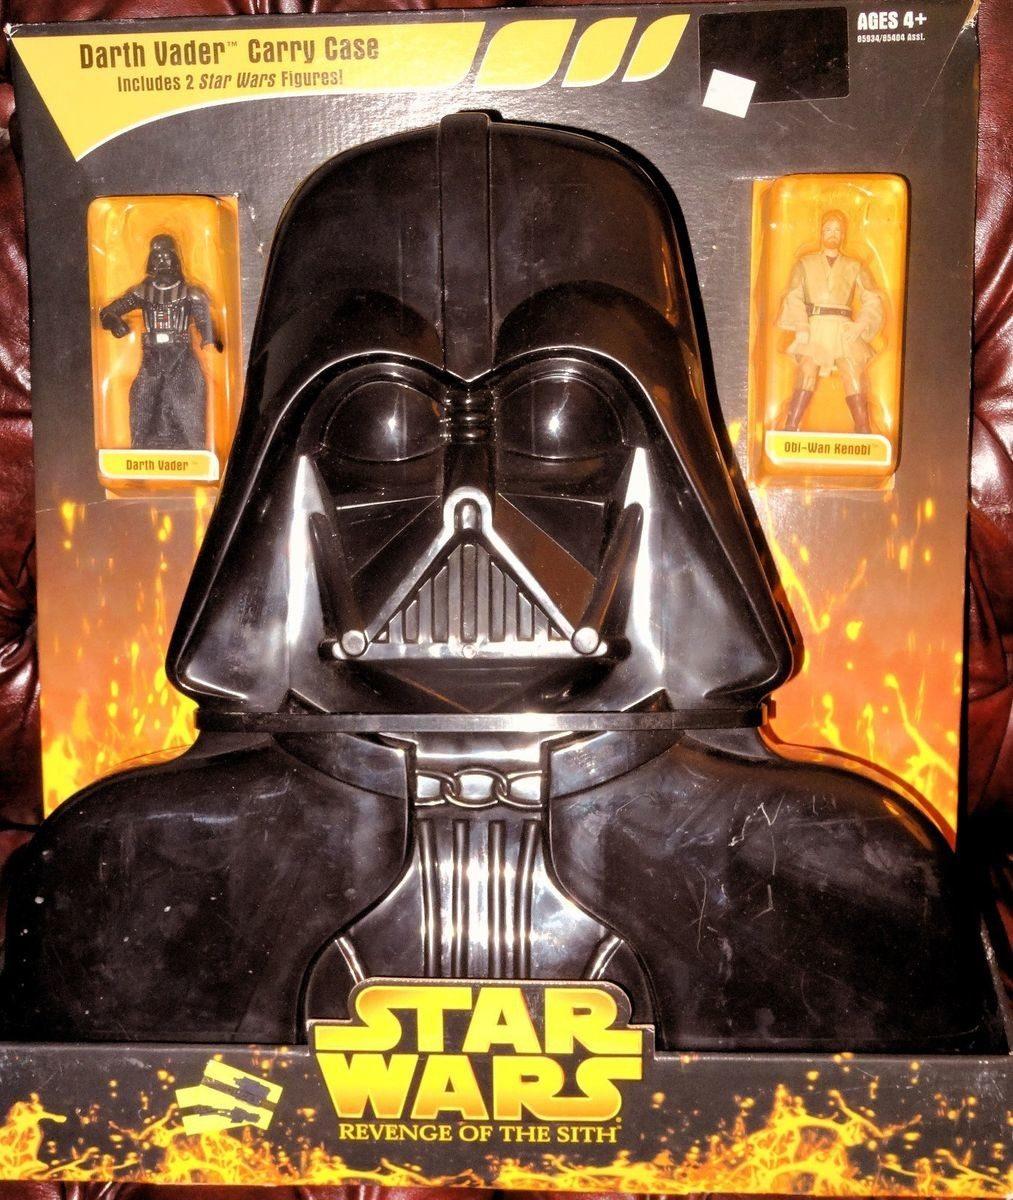 Star Wars Revenge of the Sith CelebrationIII Darth Vader Action Figure